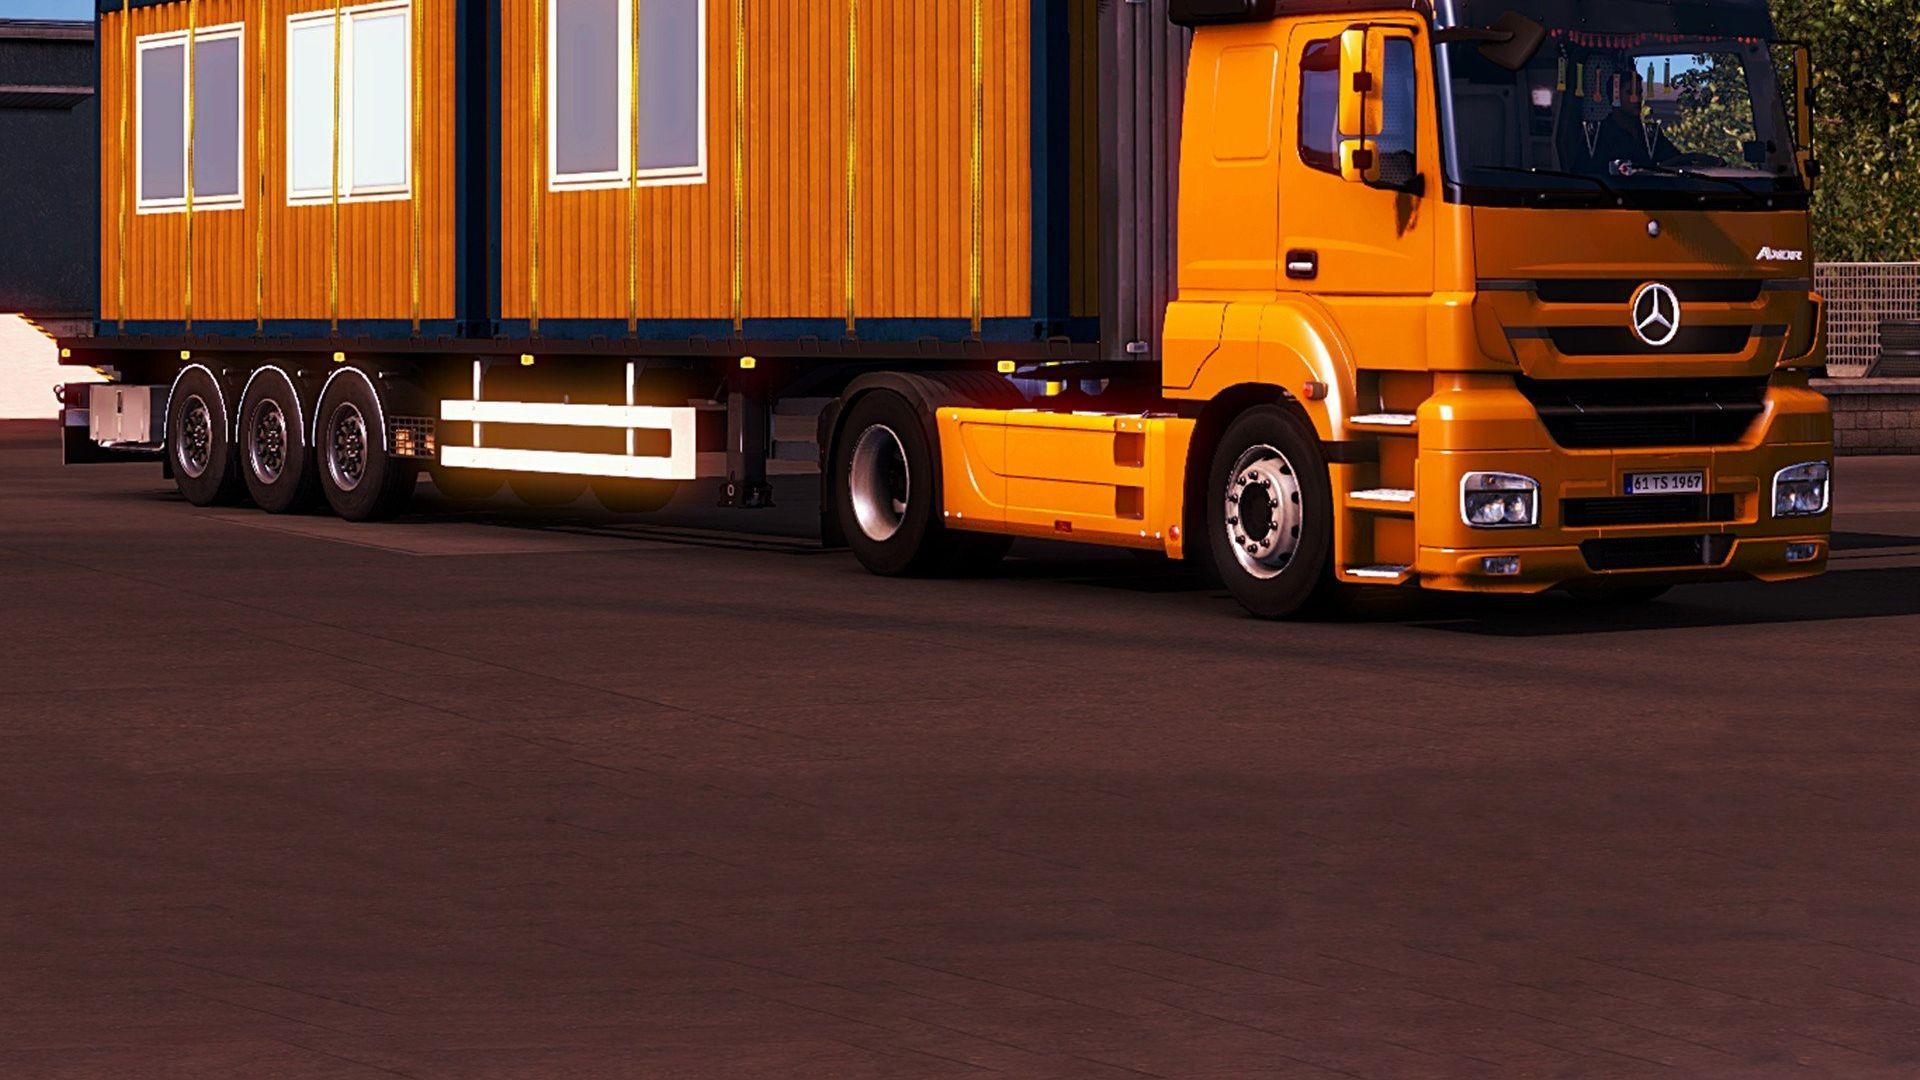 euro-truck-simulator-2-cabin-accessories-dlc-pc-steam-cd-key-satin-al-durmaplay.jpg